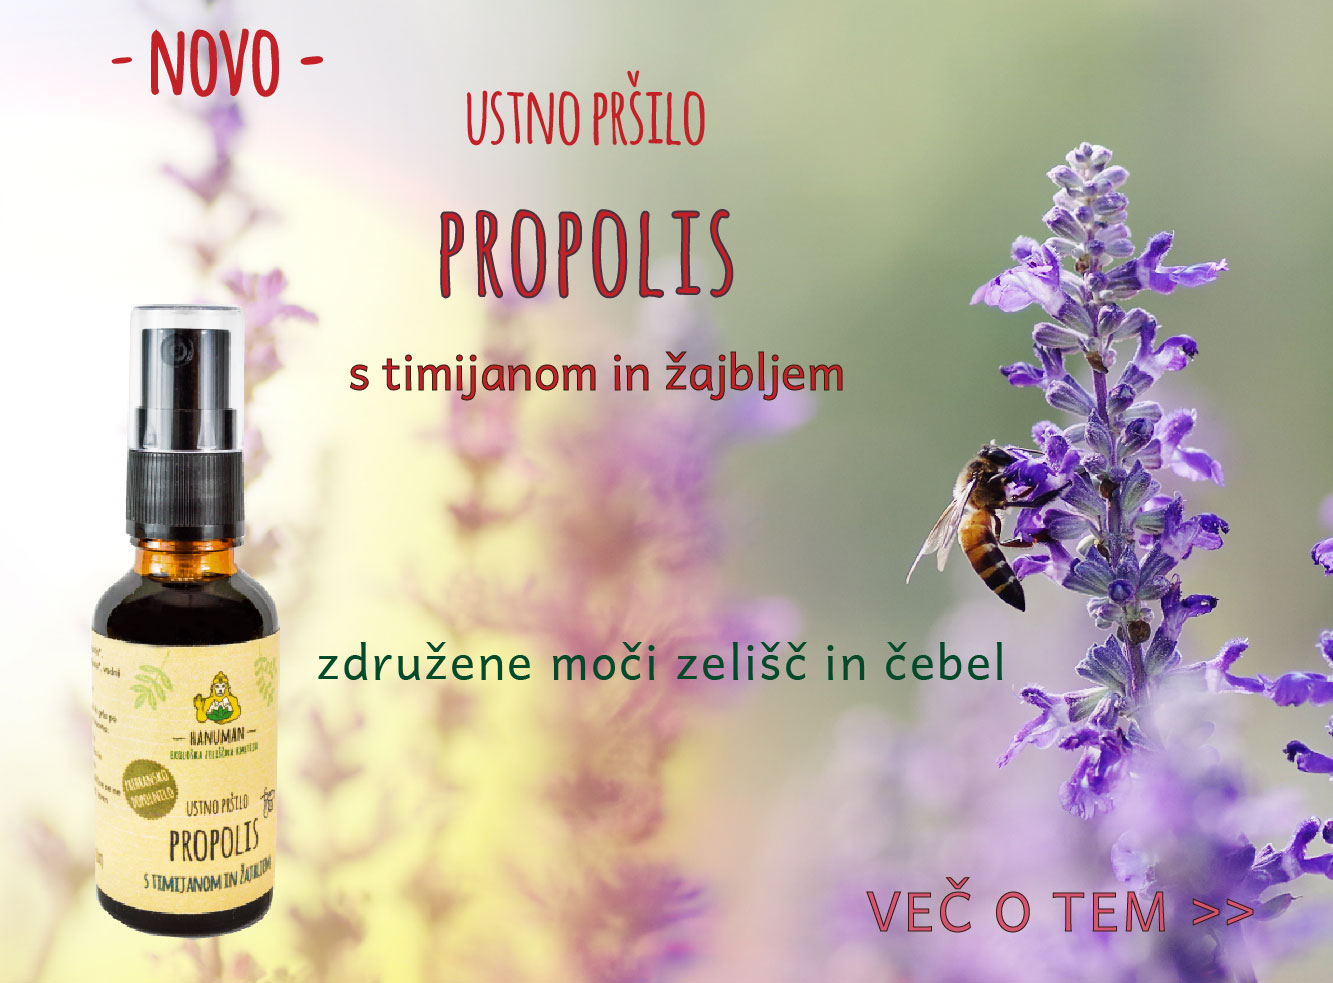 nimble_asset_banner-propolis-nov-01